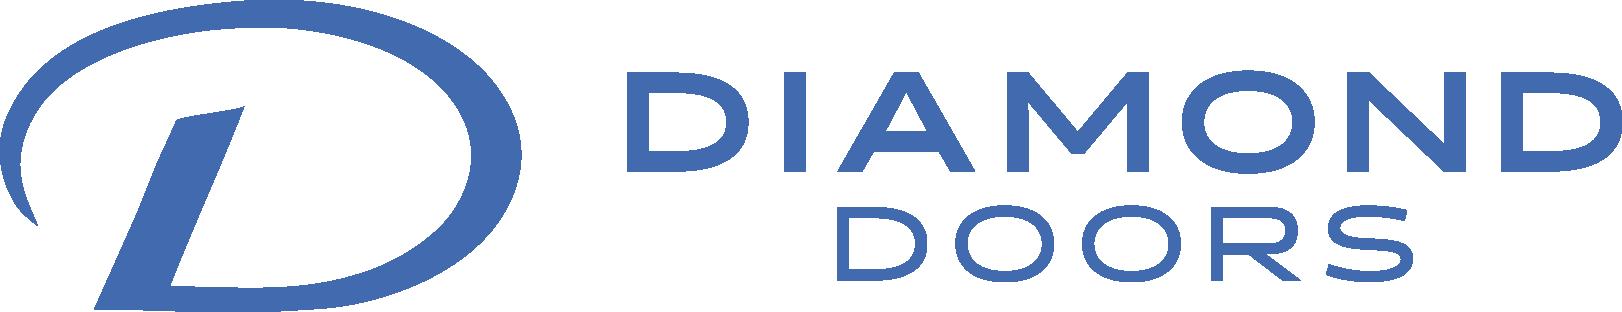 DiamondDoors_Logo.png